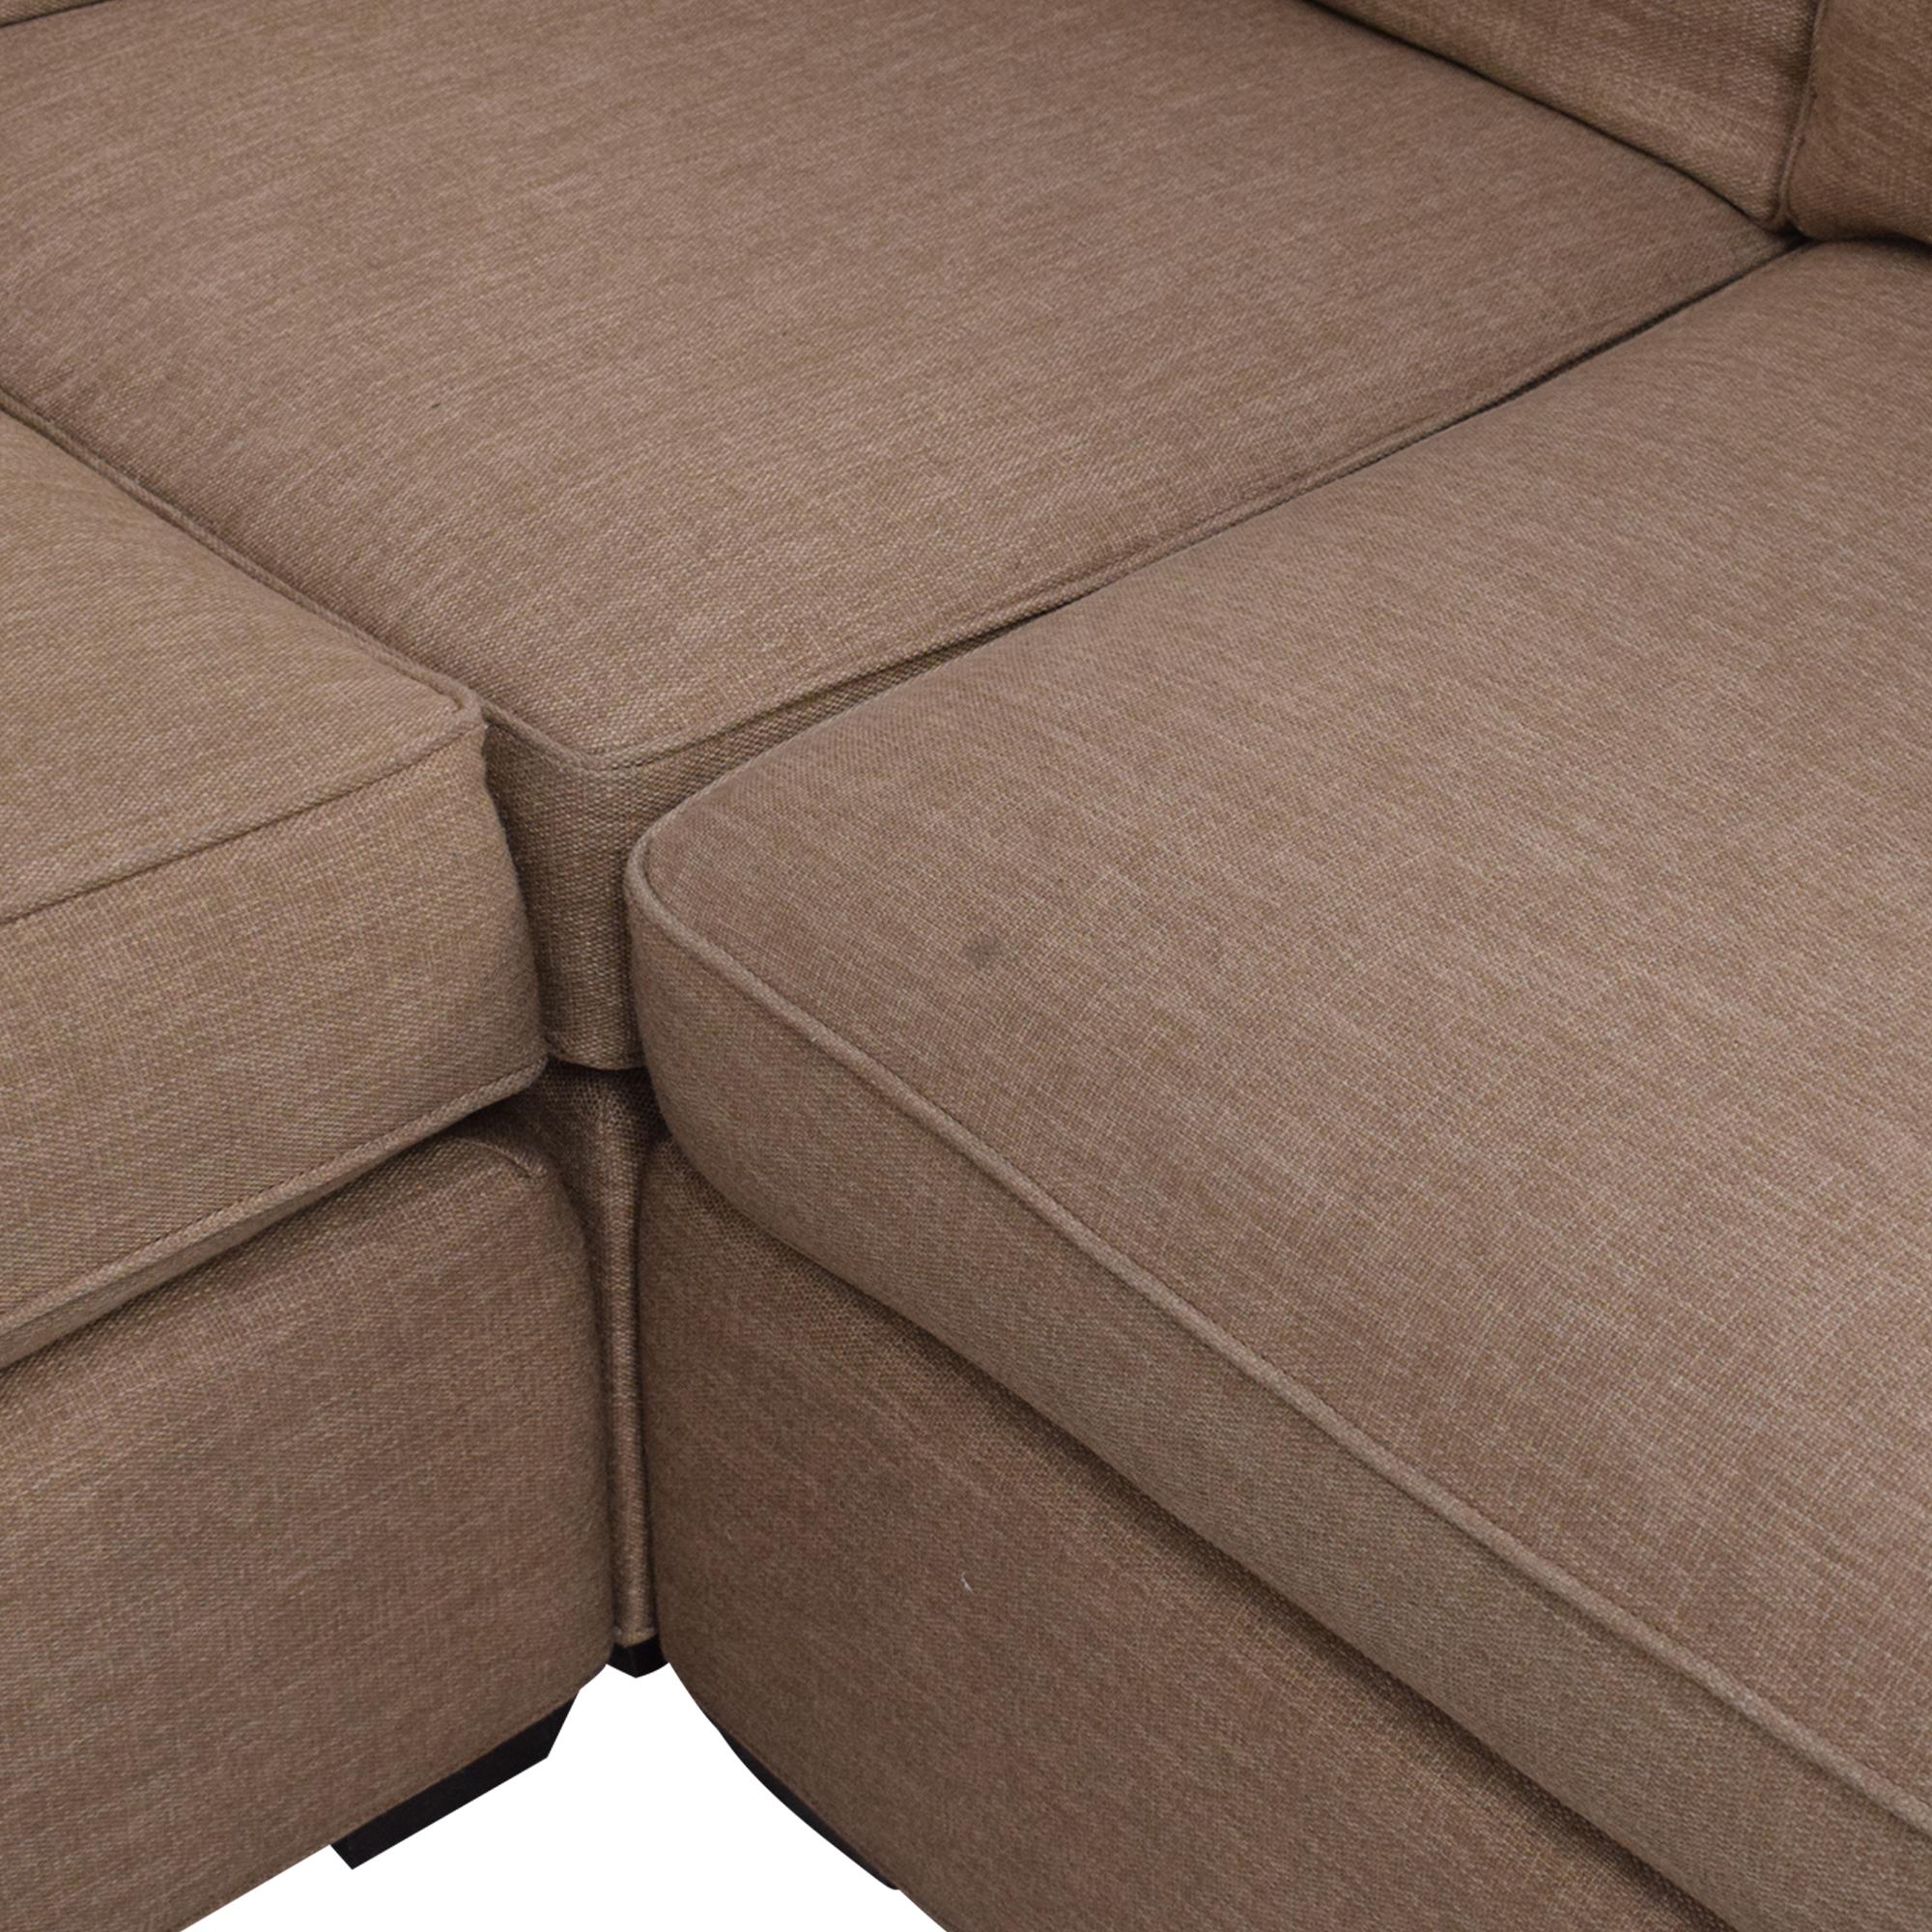 Crate & Barrel Davis Sectional Sofa / Sofas